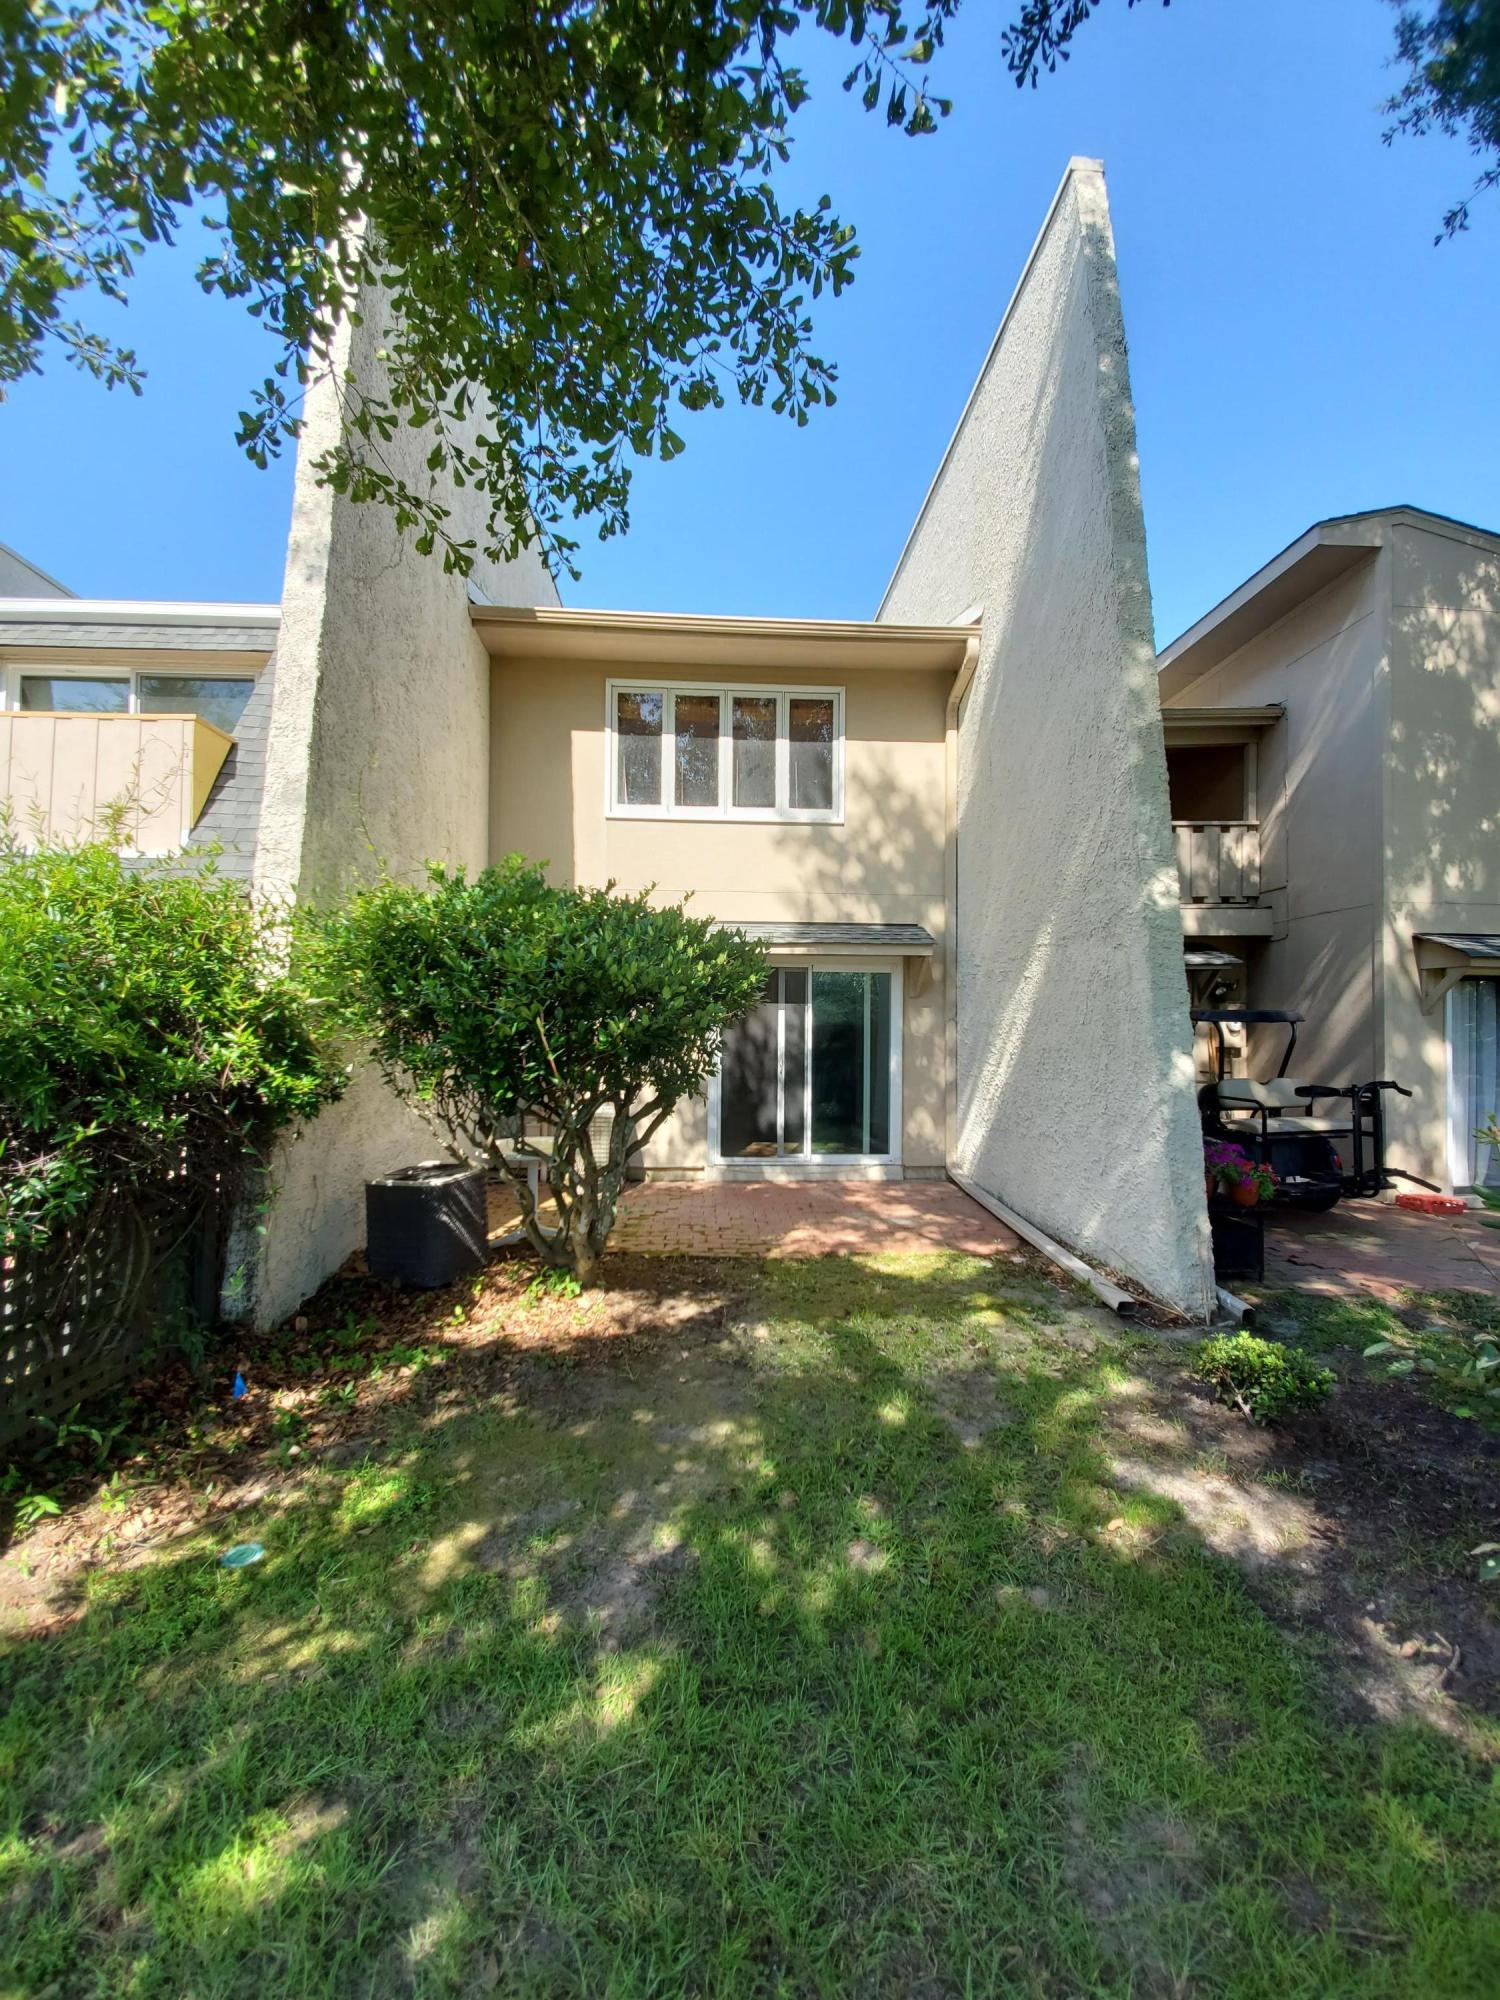 Snee Farm Homes For Sale - 105 Ventura, Mount Pleasant, SC - 5